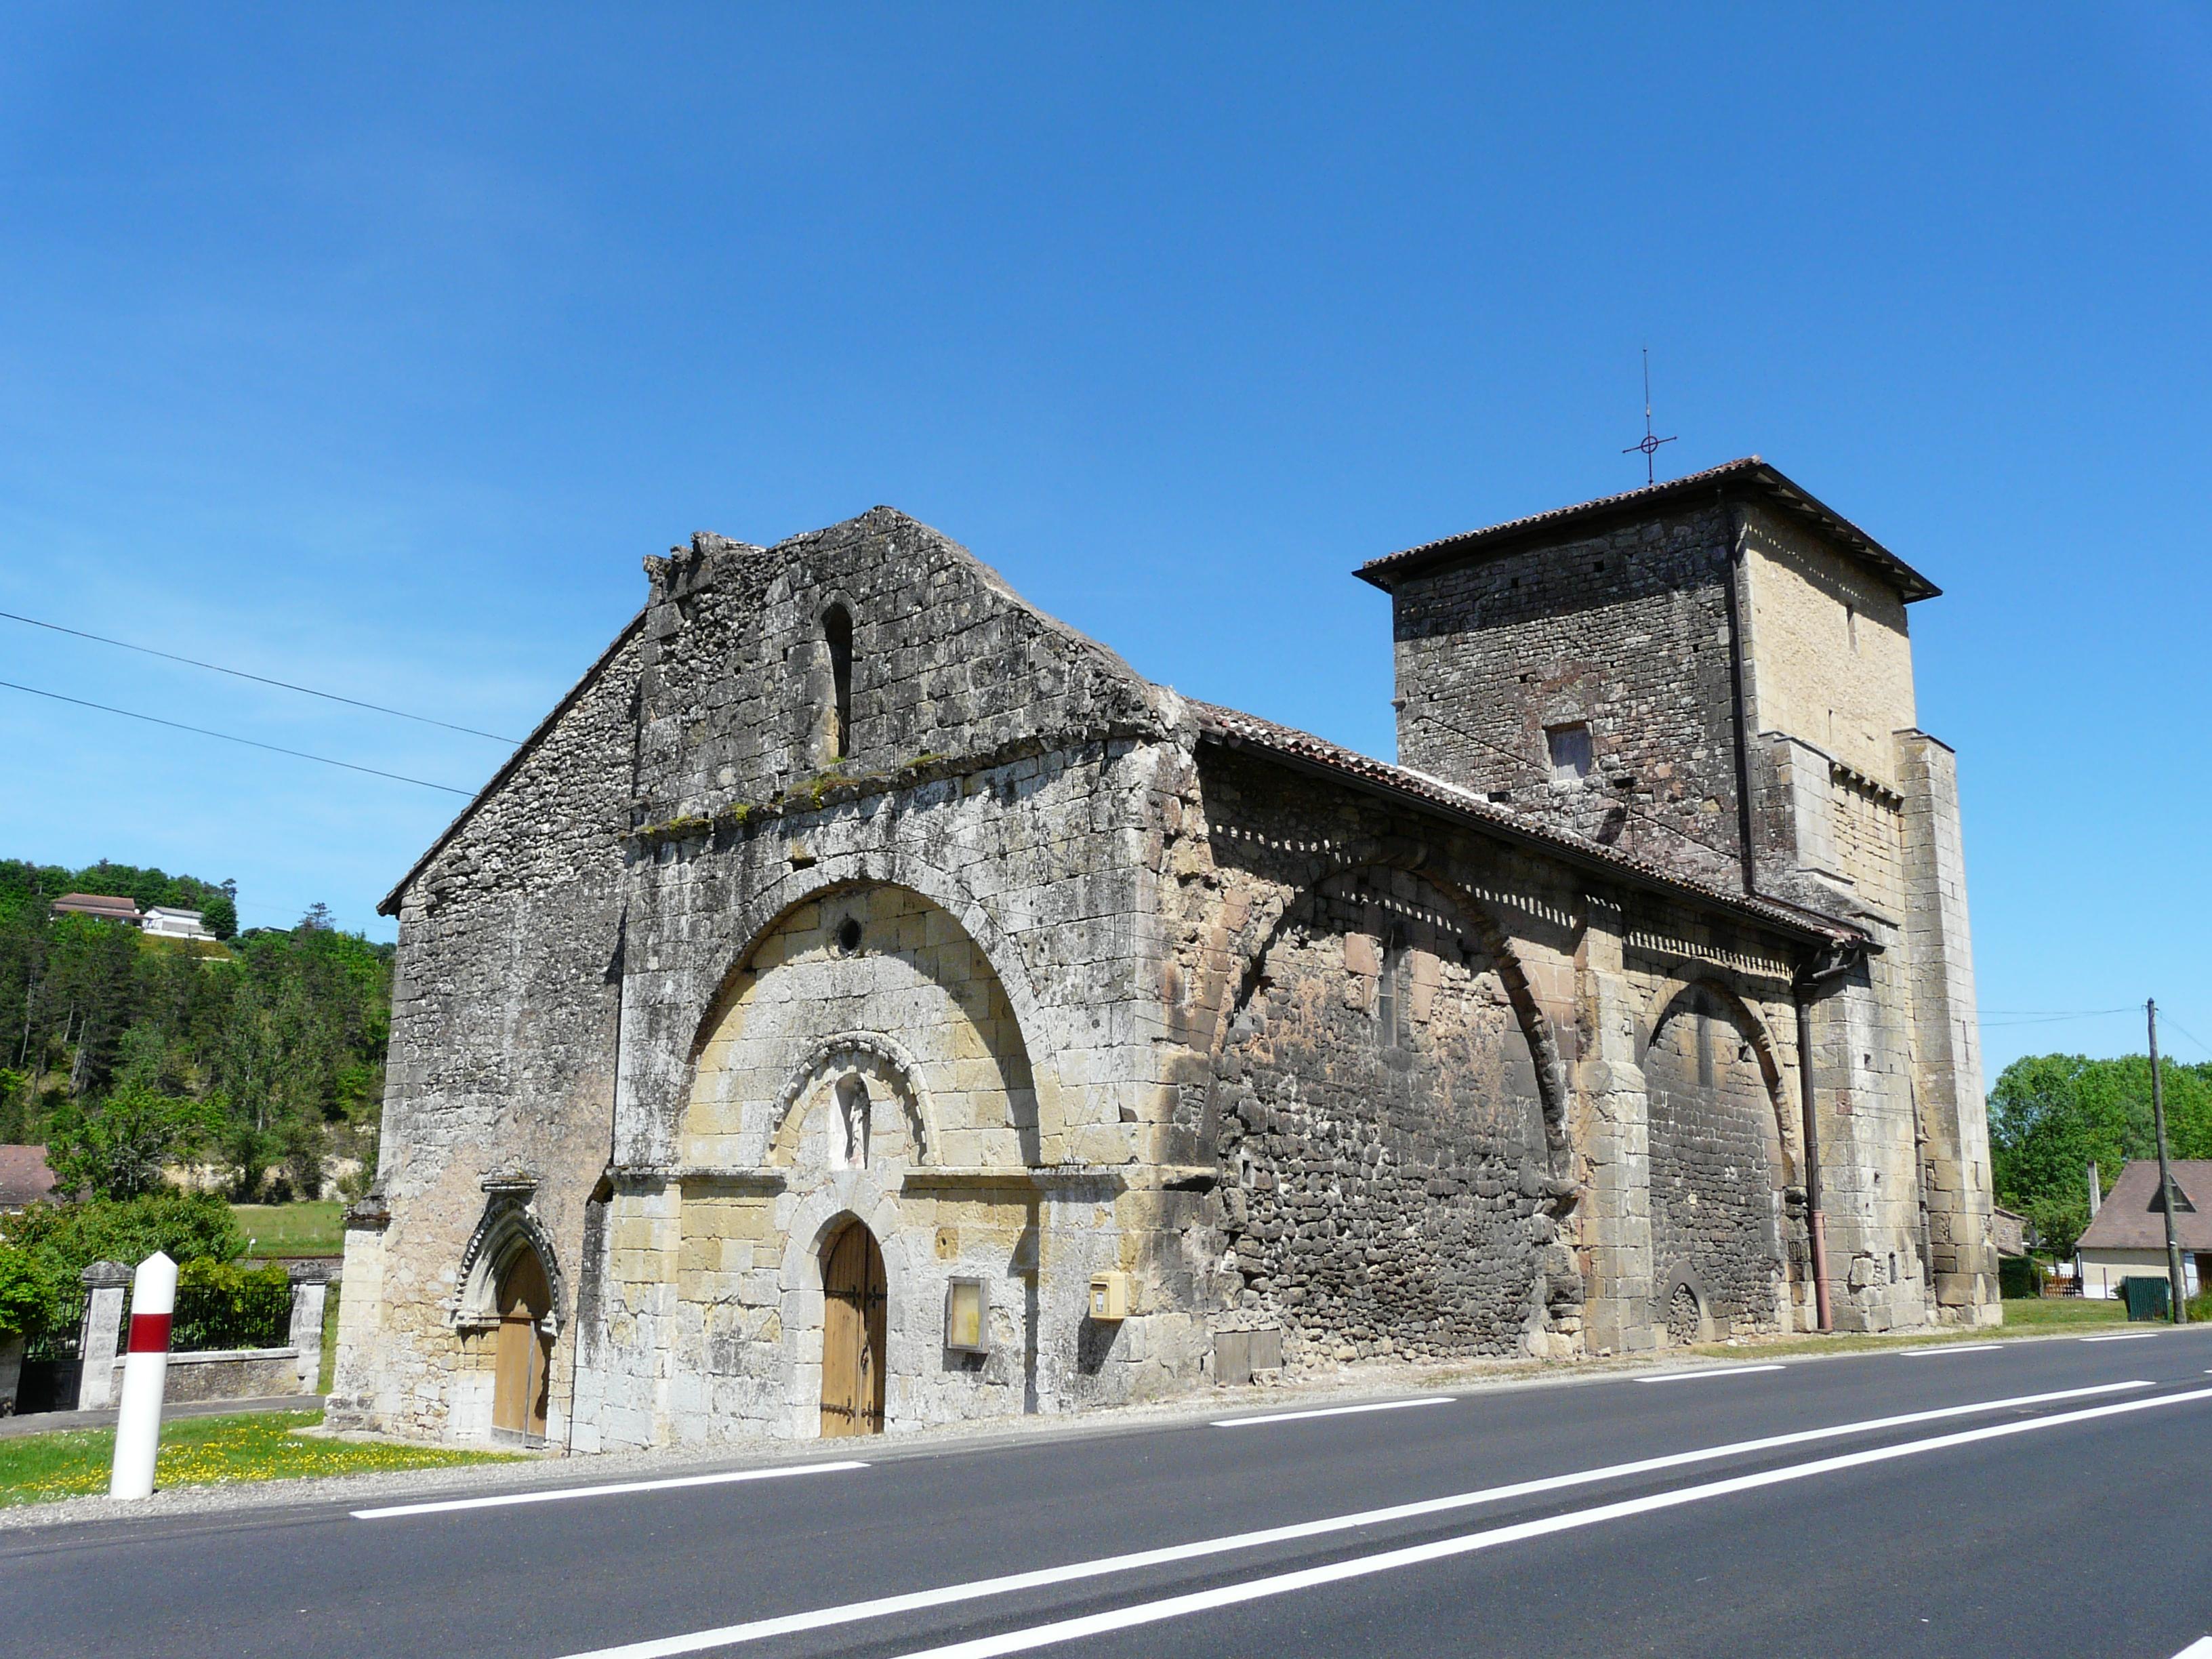 Sainte-Marie-de-Chignac